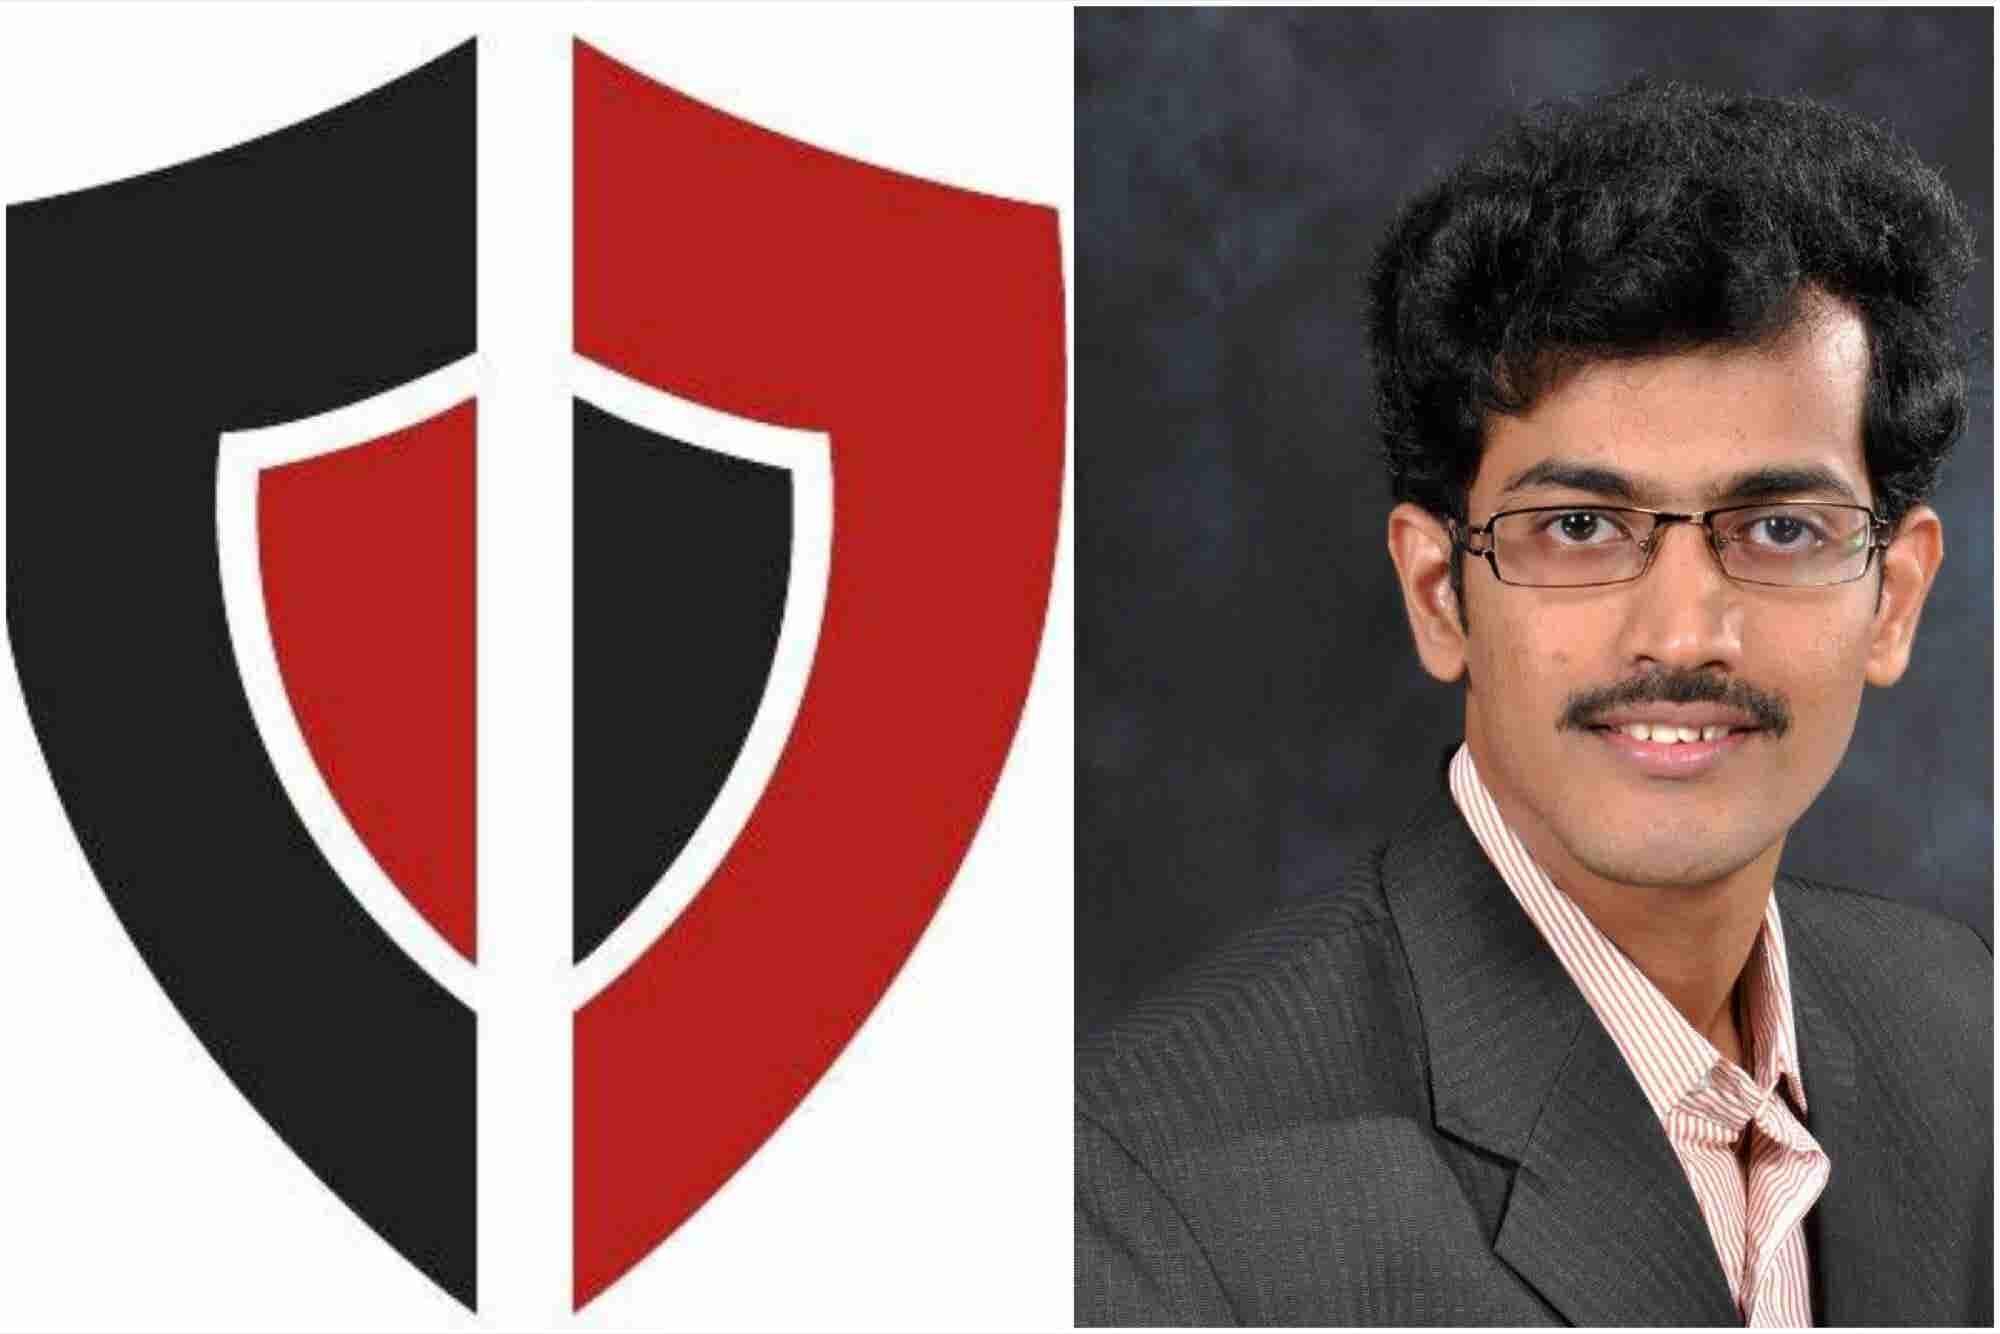 This Bengaluru Guy is Taking on Google's reCaptcha